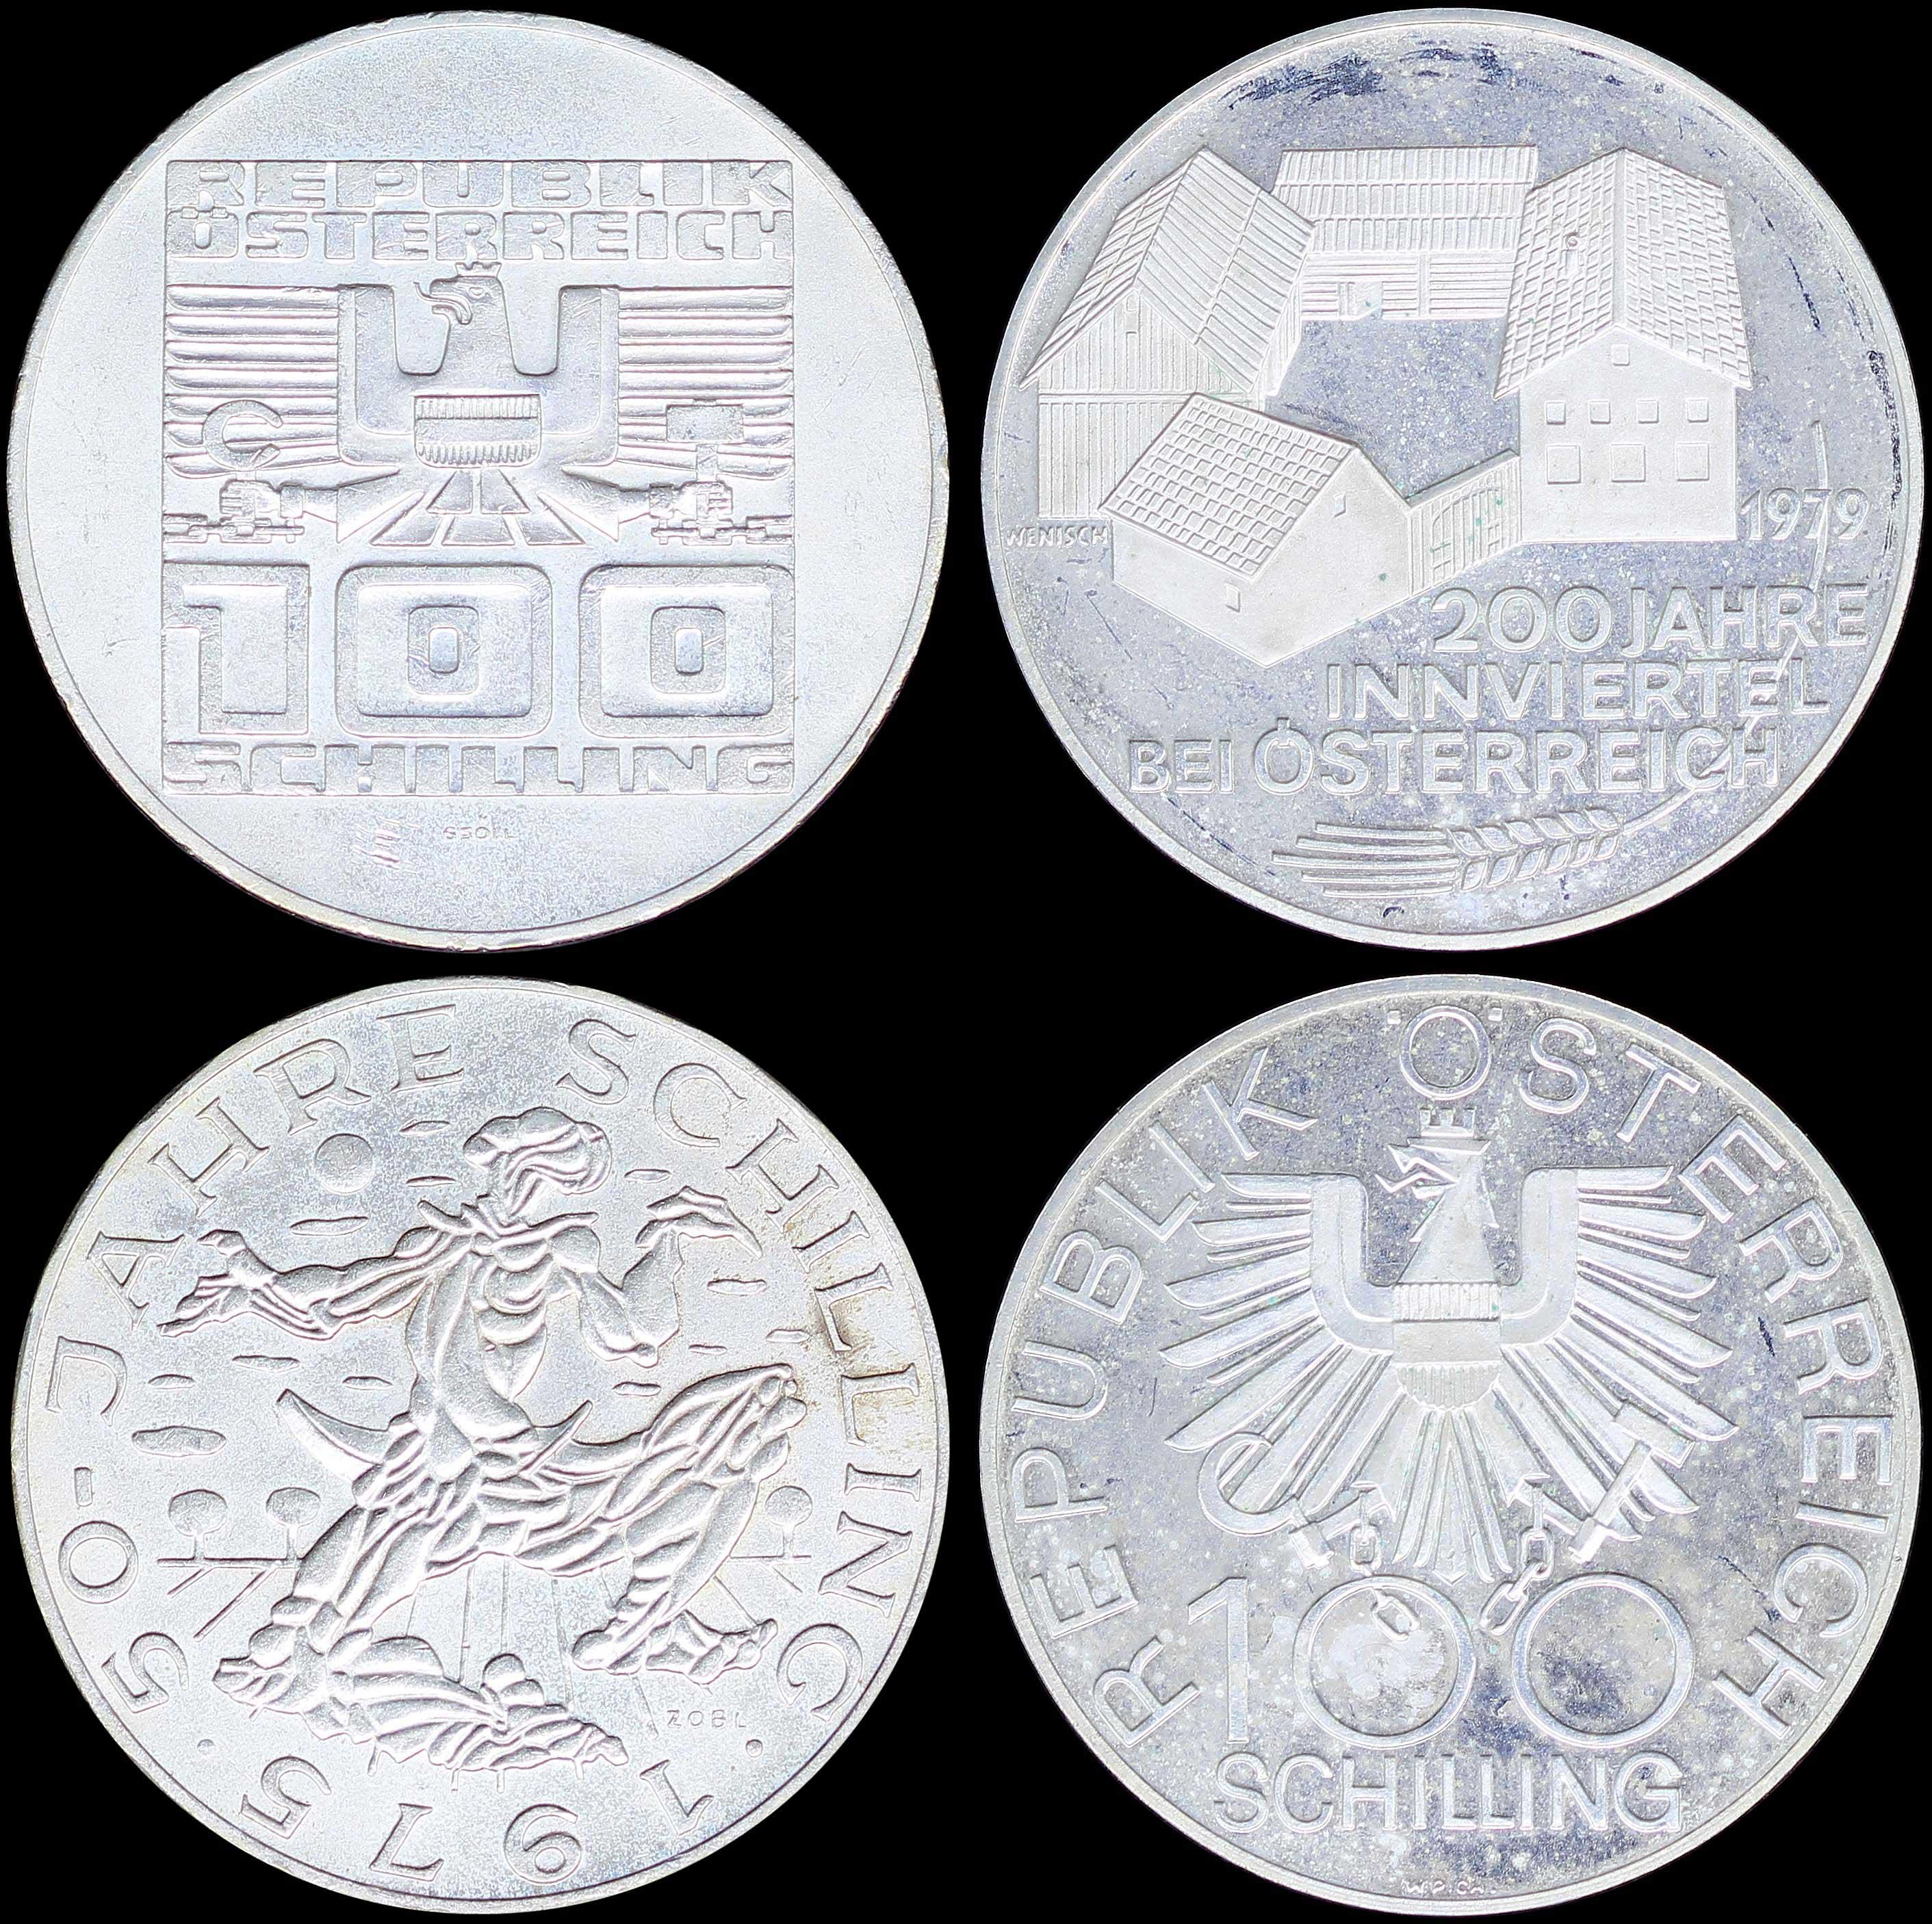 Lot 6798 - -  COINS & TOKENS COINS & TOKENS OF EUROPEAN COUNTRIES -  A. Karamitsos Postal & Live Internet Auction 984 (Part B)